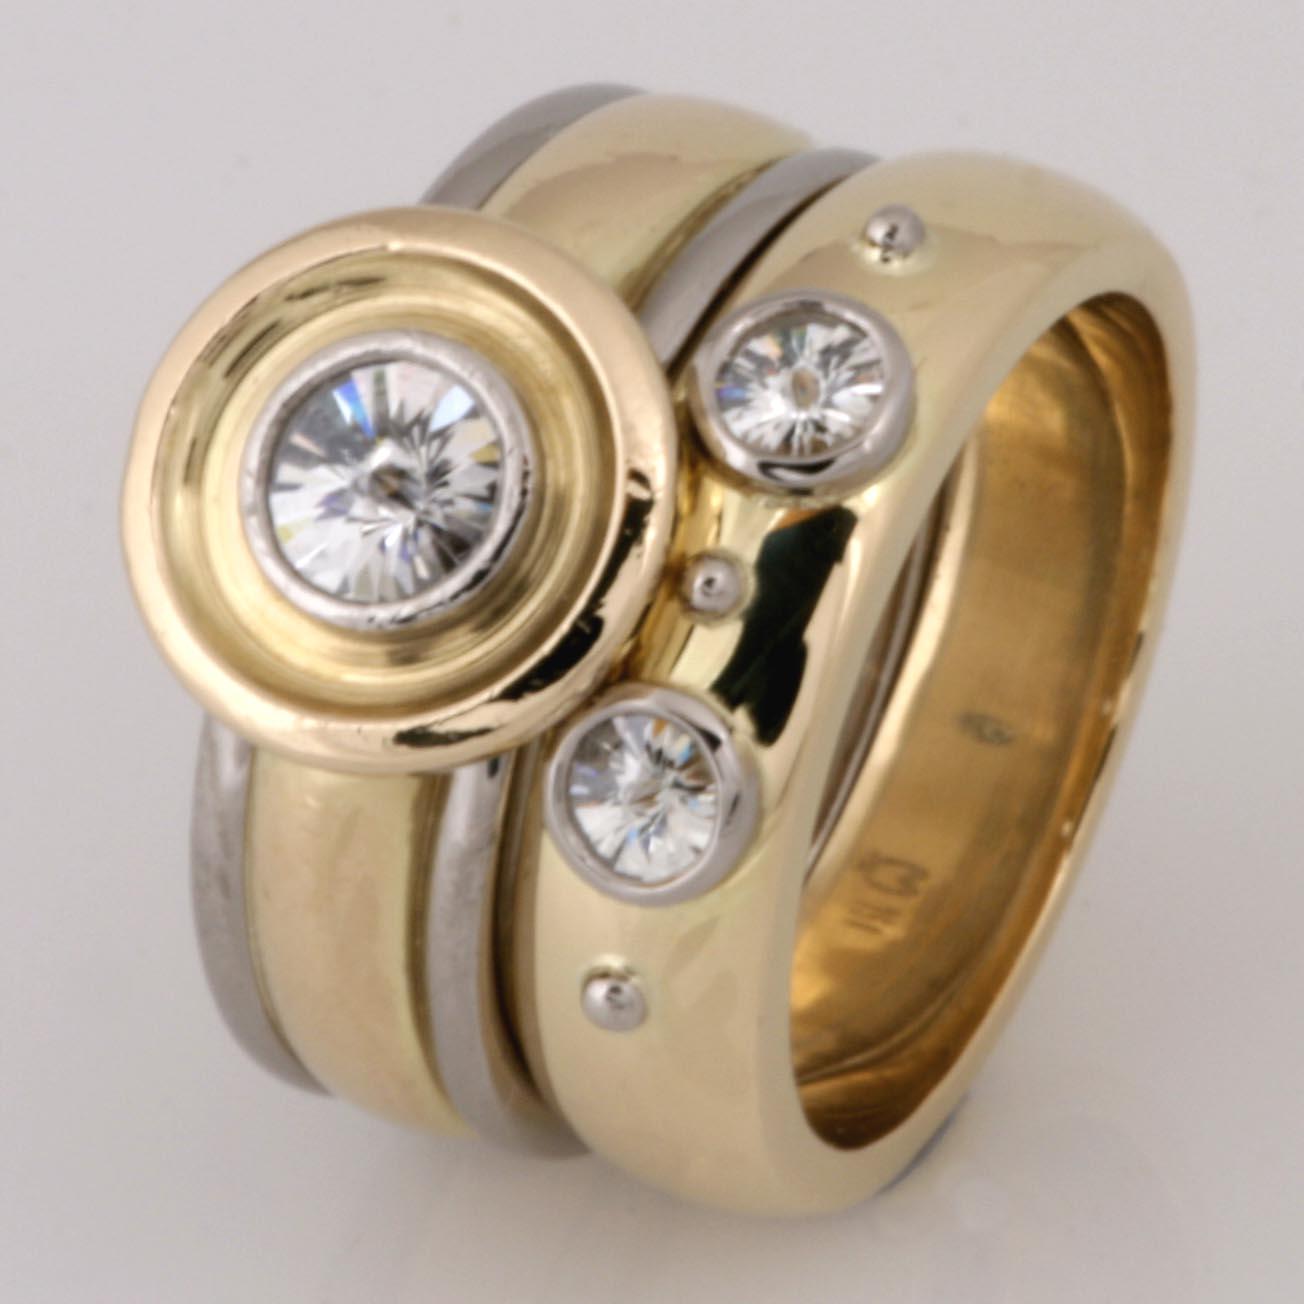 Handmade ladies 18ct yellow and white gold 'Sprit' cut diamond wedding set